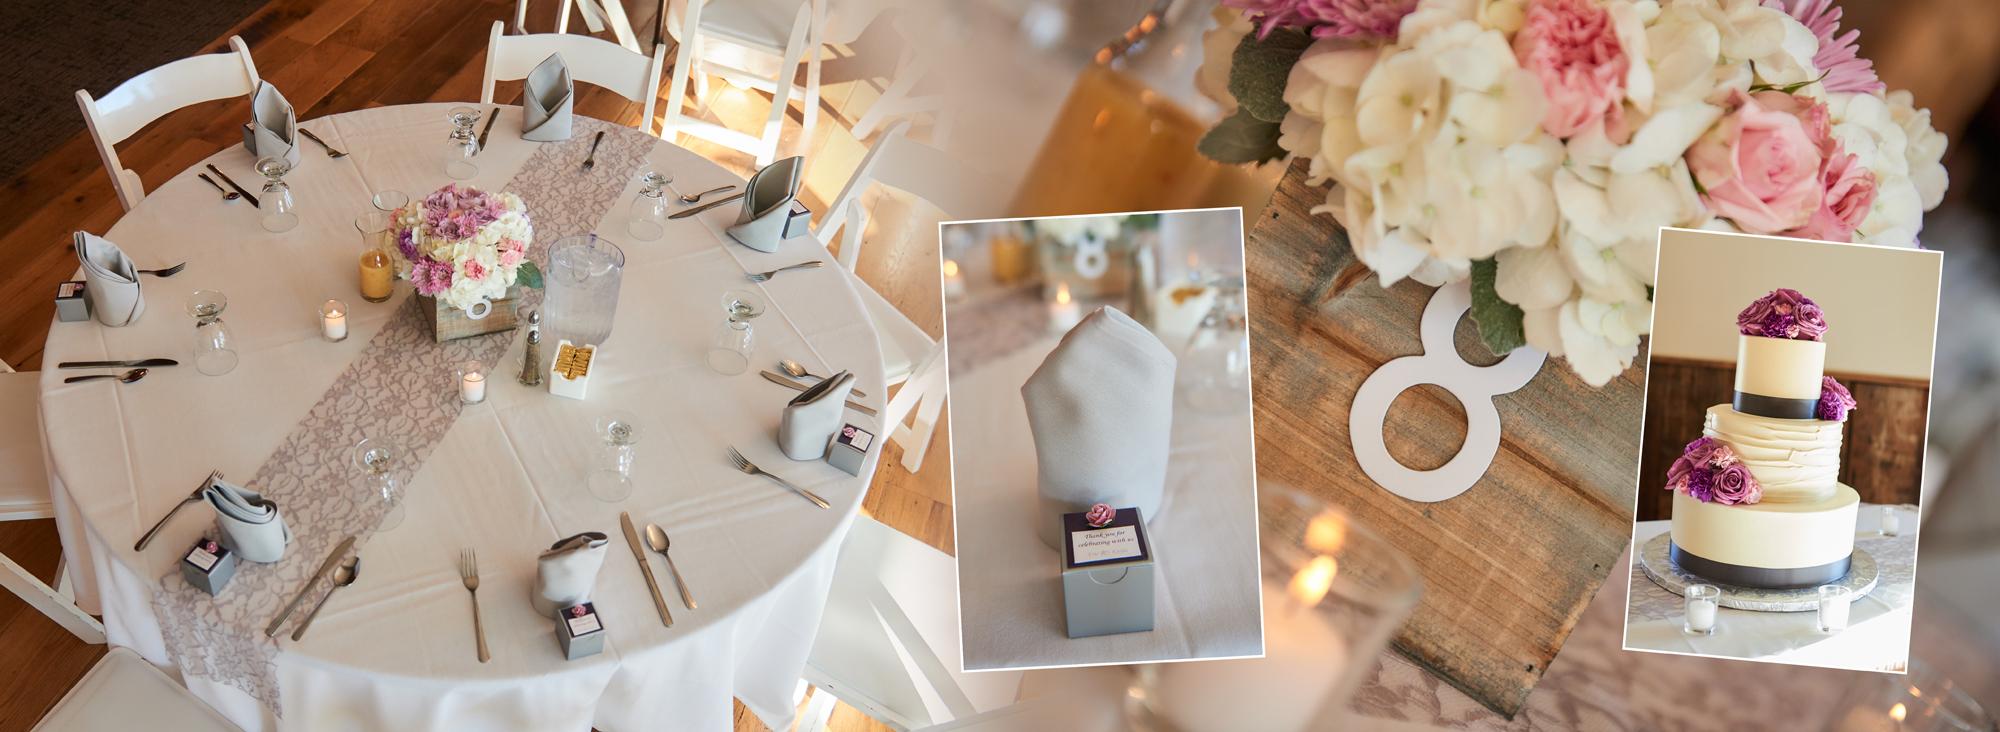 Dave_Soucy_APM_wedding_photography.033.jpg